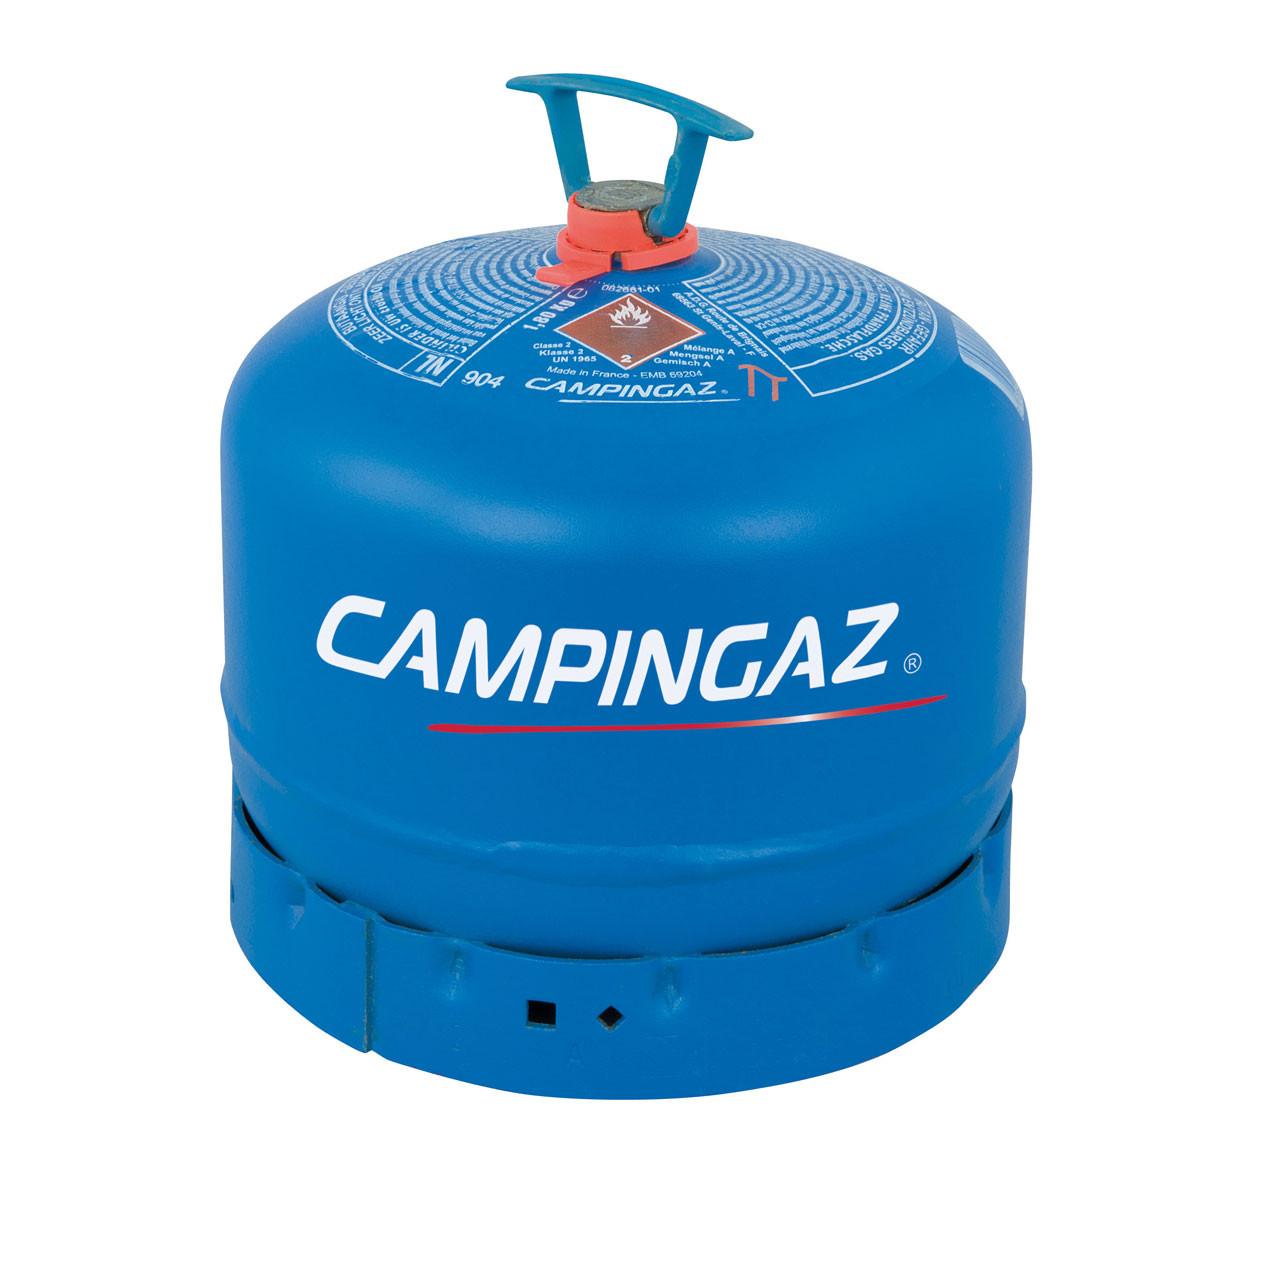 Campingaz 904 Gas Cylinder Refill